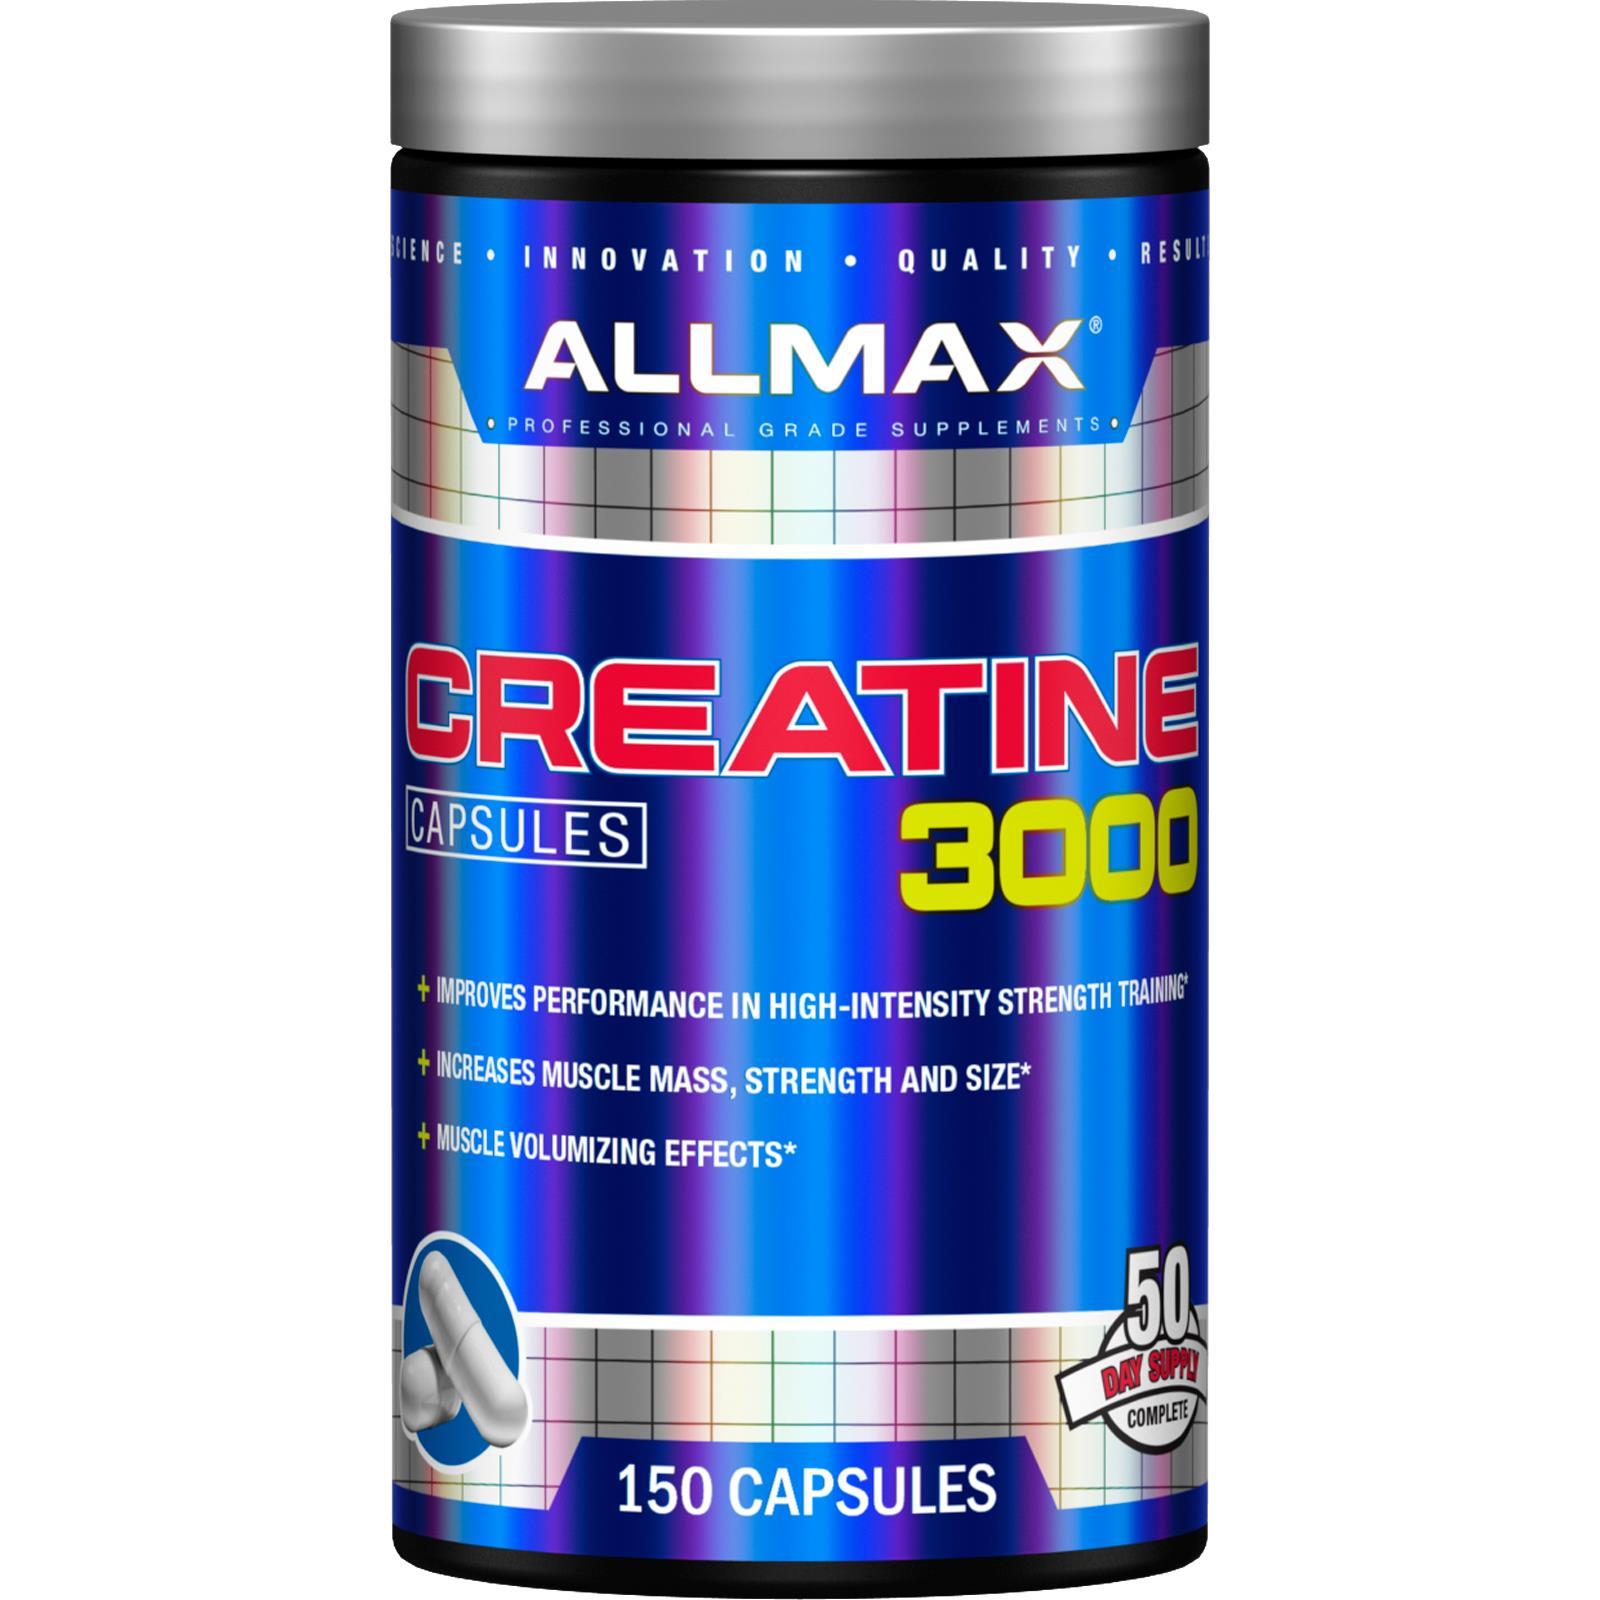 CREATINE 3000 ALLMAX